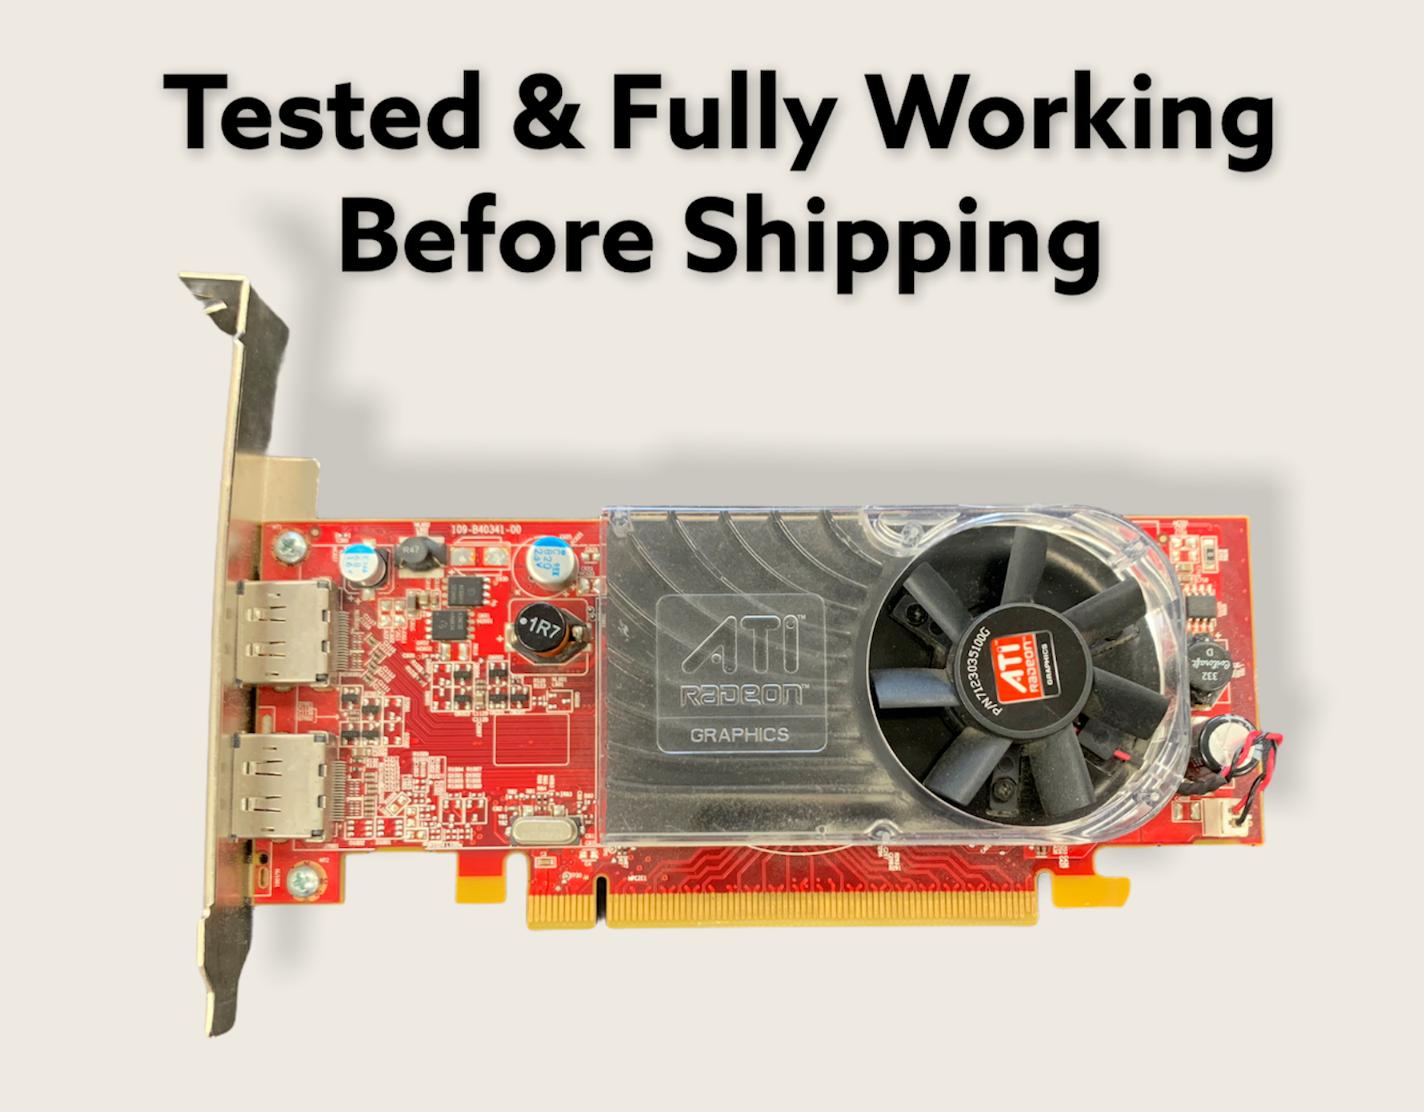 ATI Radeon B403 ATI-102-B40319(B) w 2 Display Port Video Card